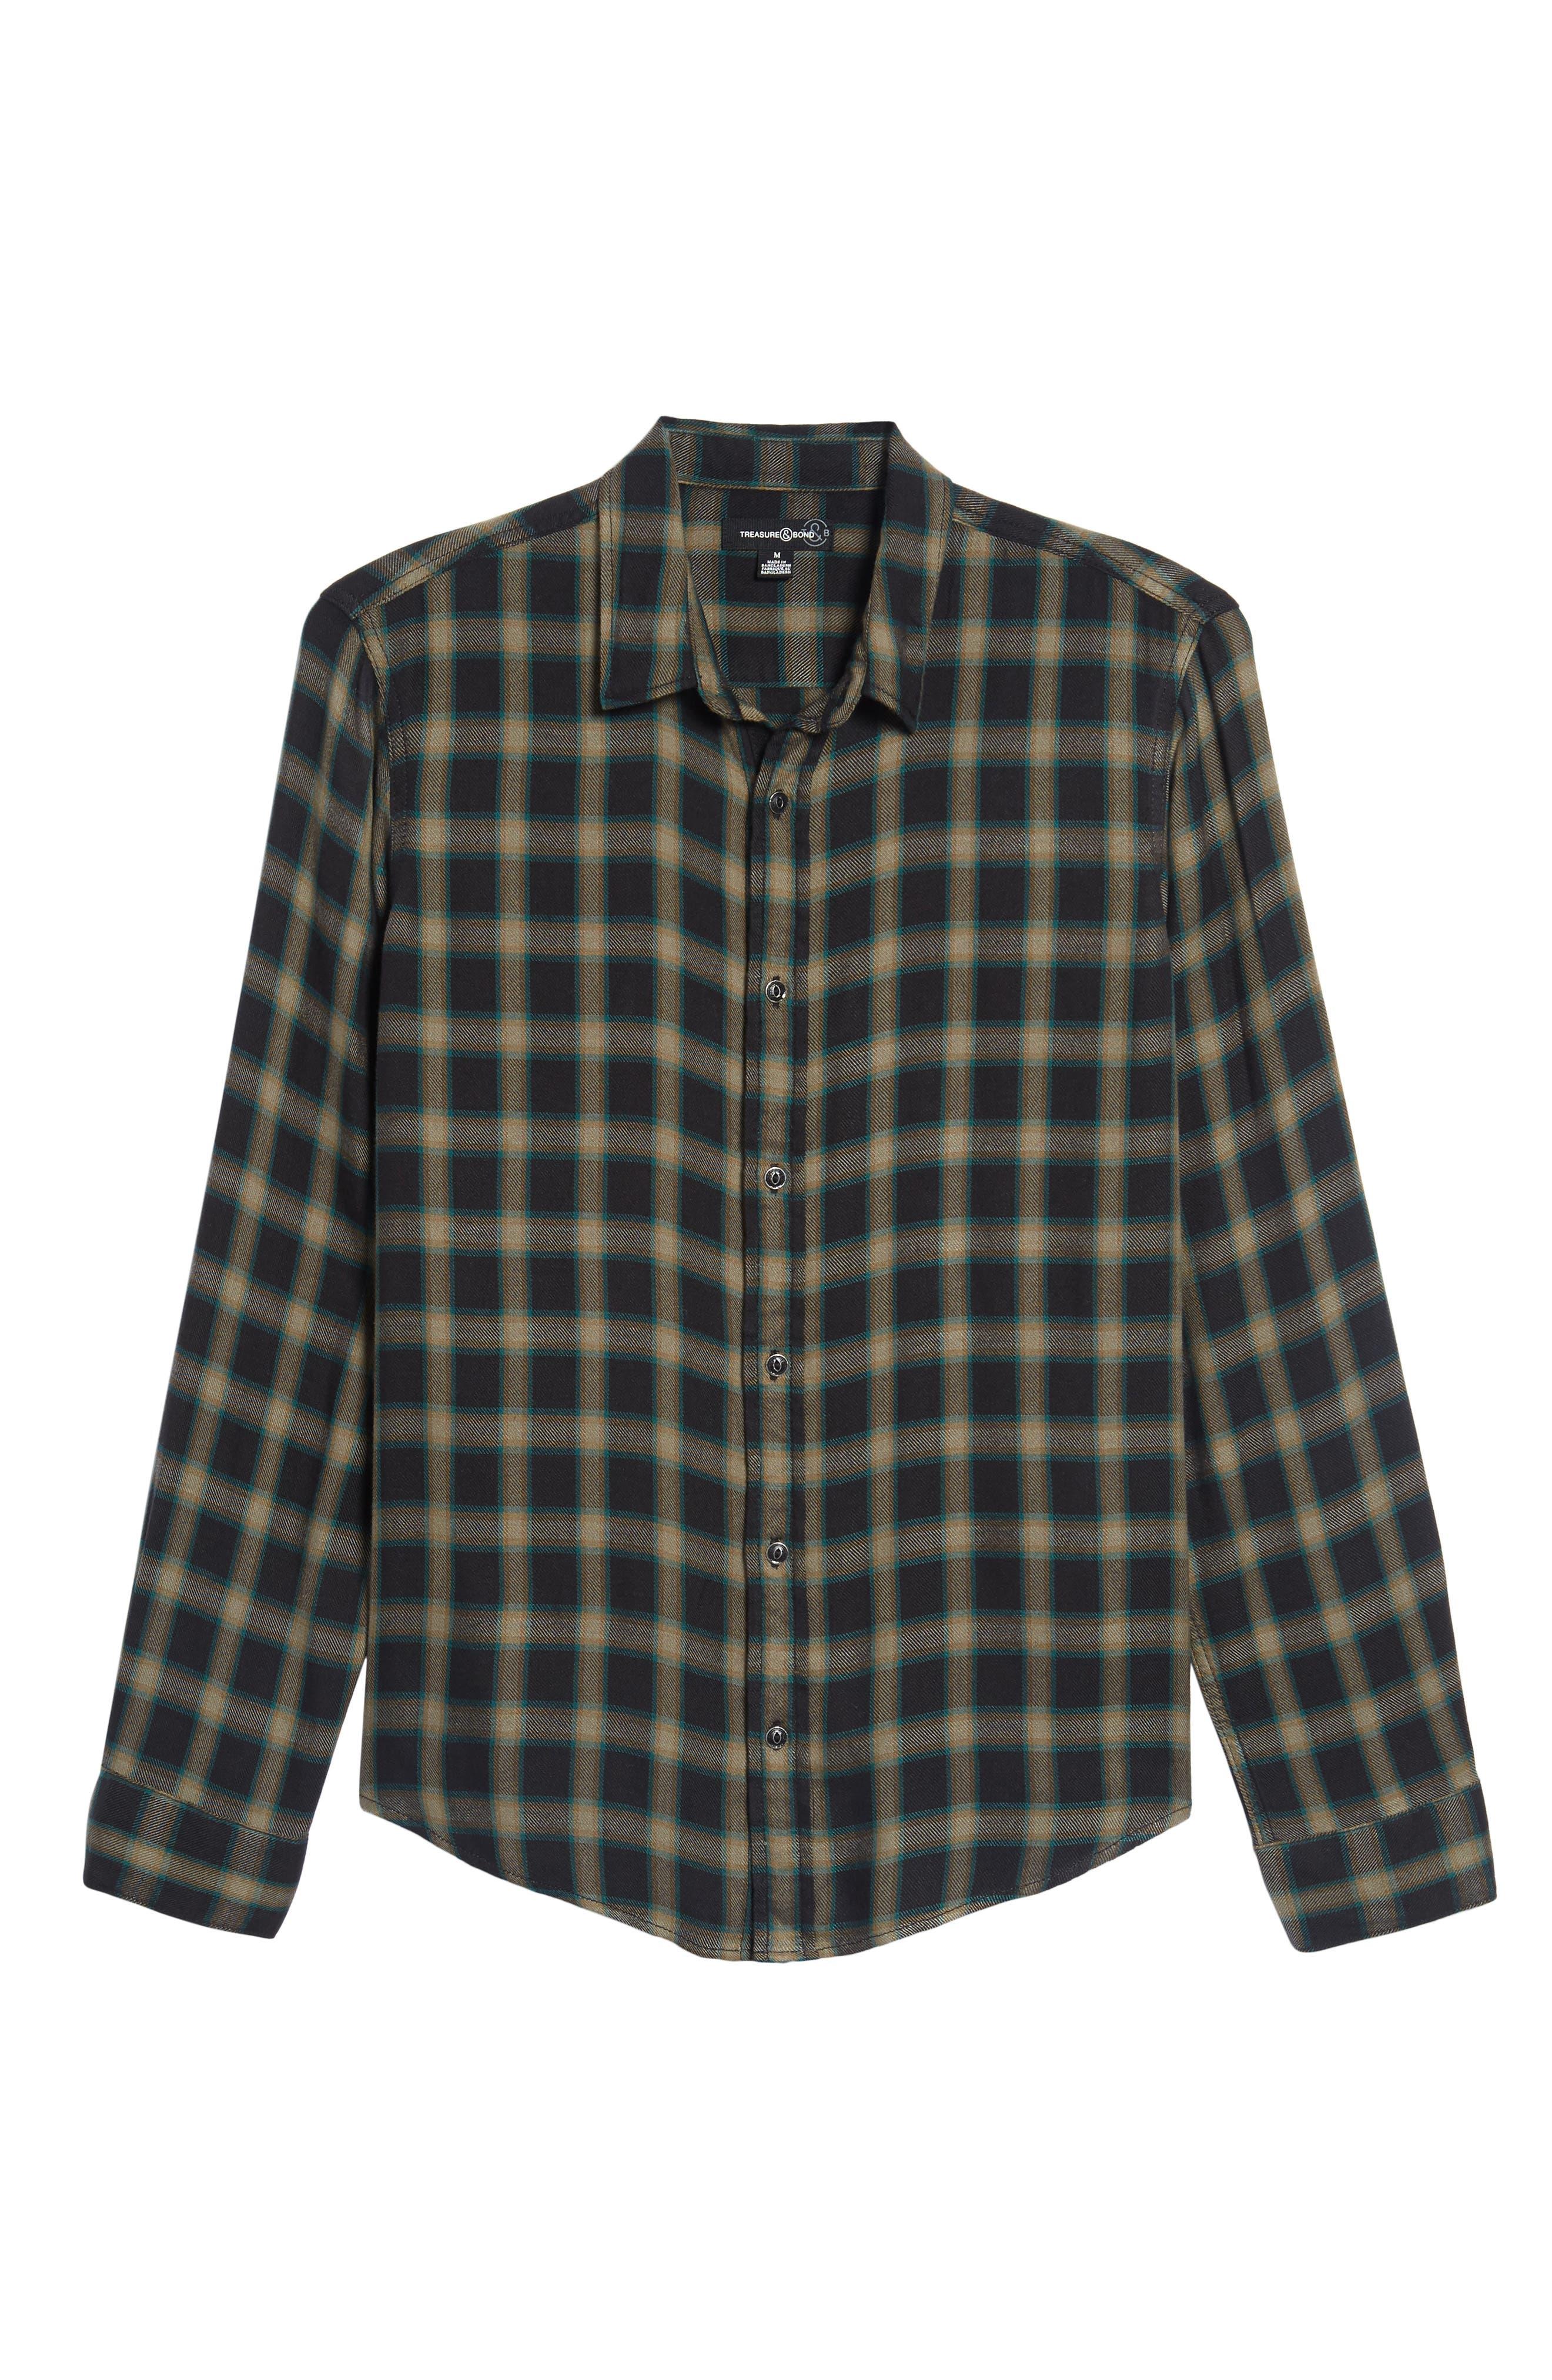 Virgil Plaid Sport Shirt,                             Alternate thumbnail 6, color,                             Black Rock Green Edocha Plaid